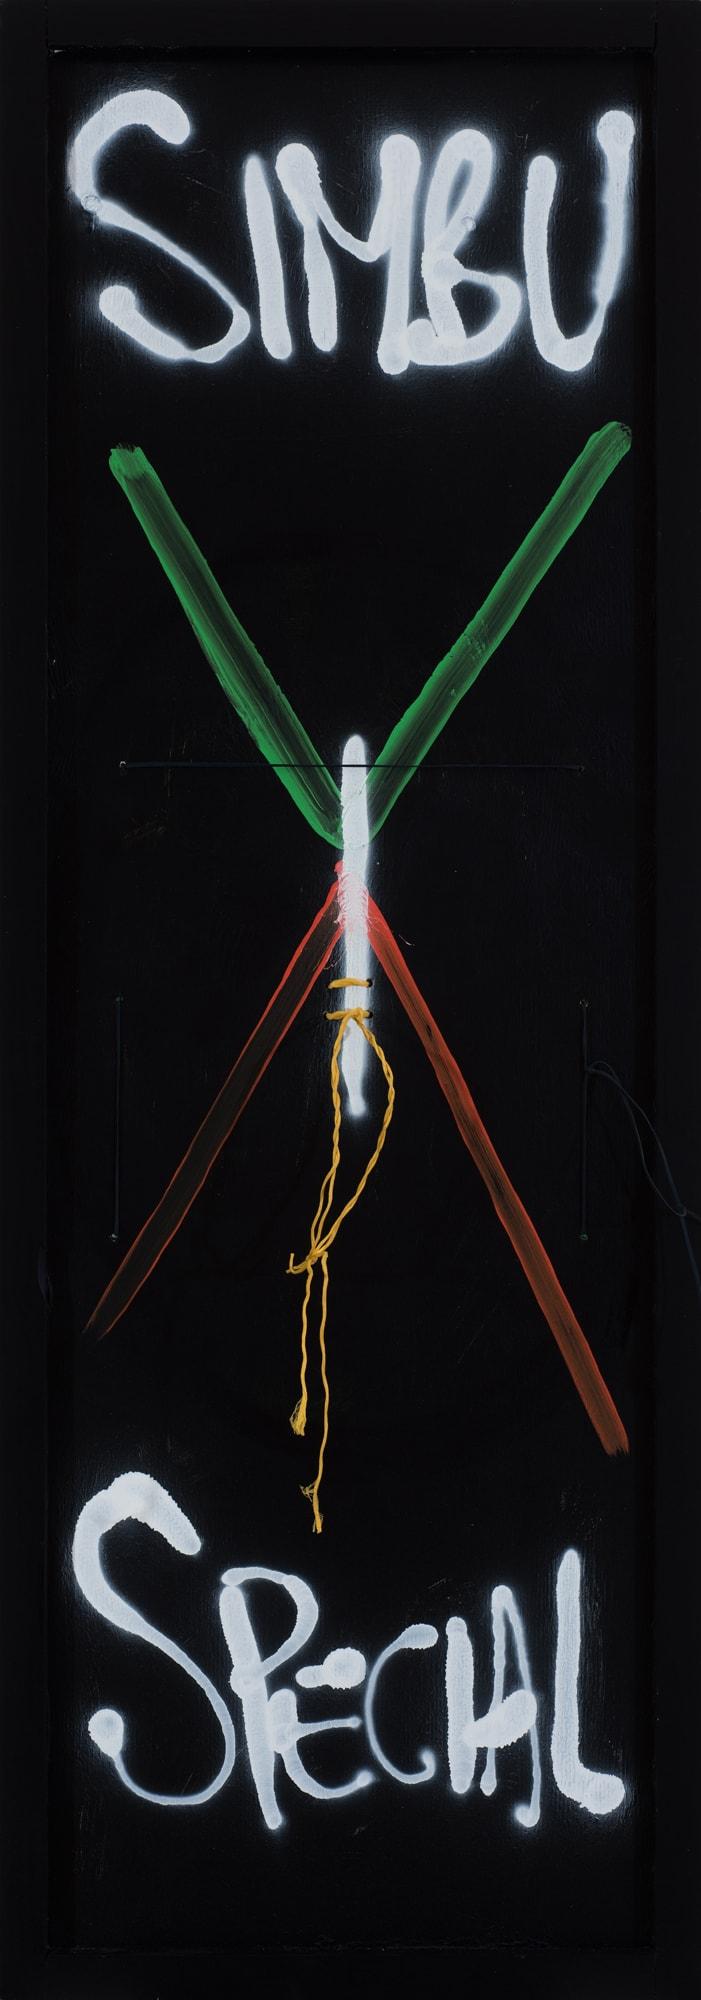 Eric Bridgman, Simbu Special (verso), 170x60cm